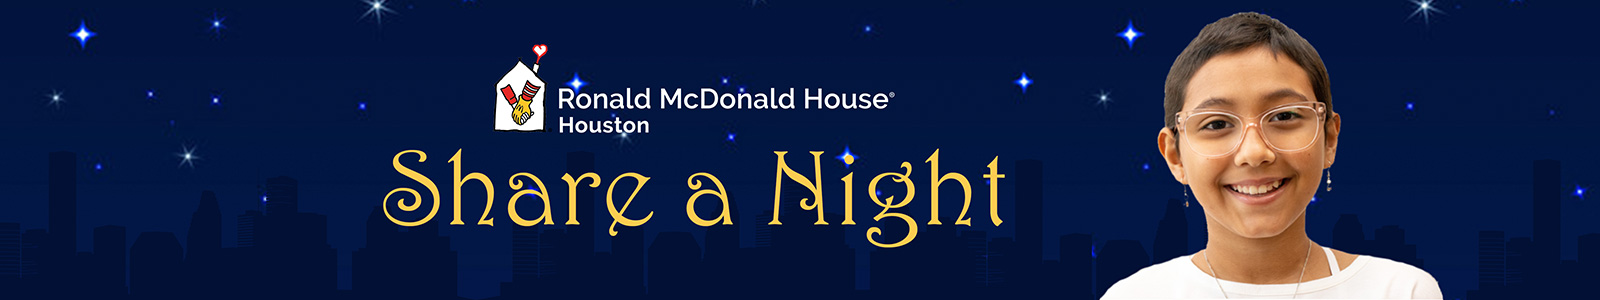 Share A Night